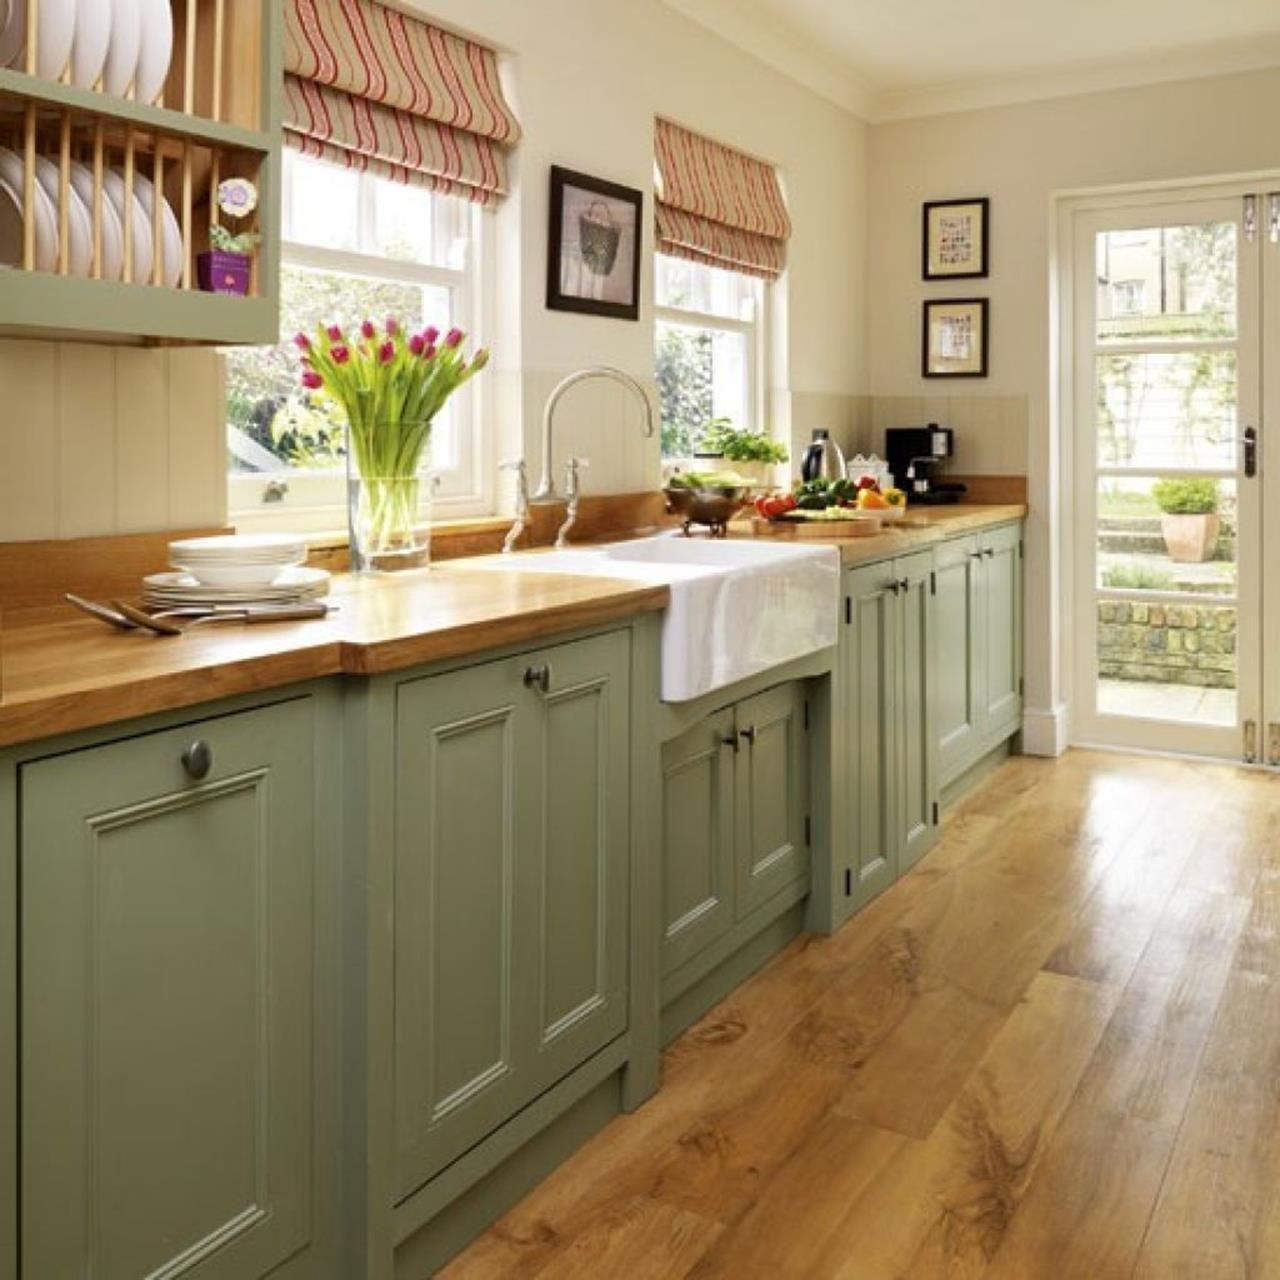 51 Green Kitchen Designs: Country Cottage Kitchen Decorating Ideas 11 In 2019